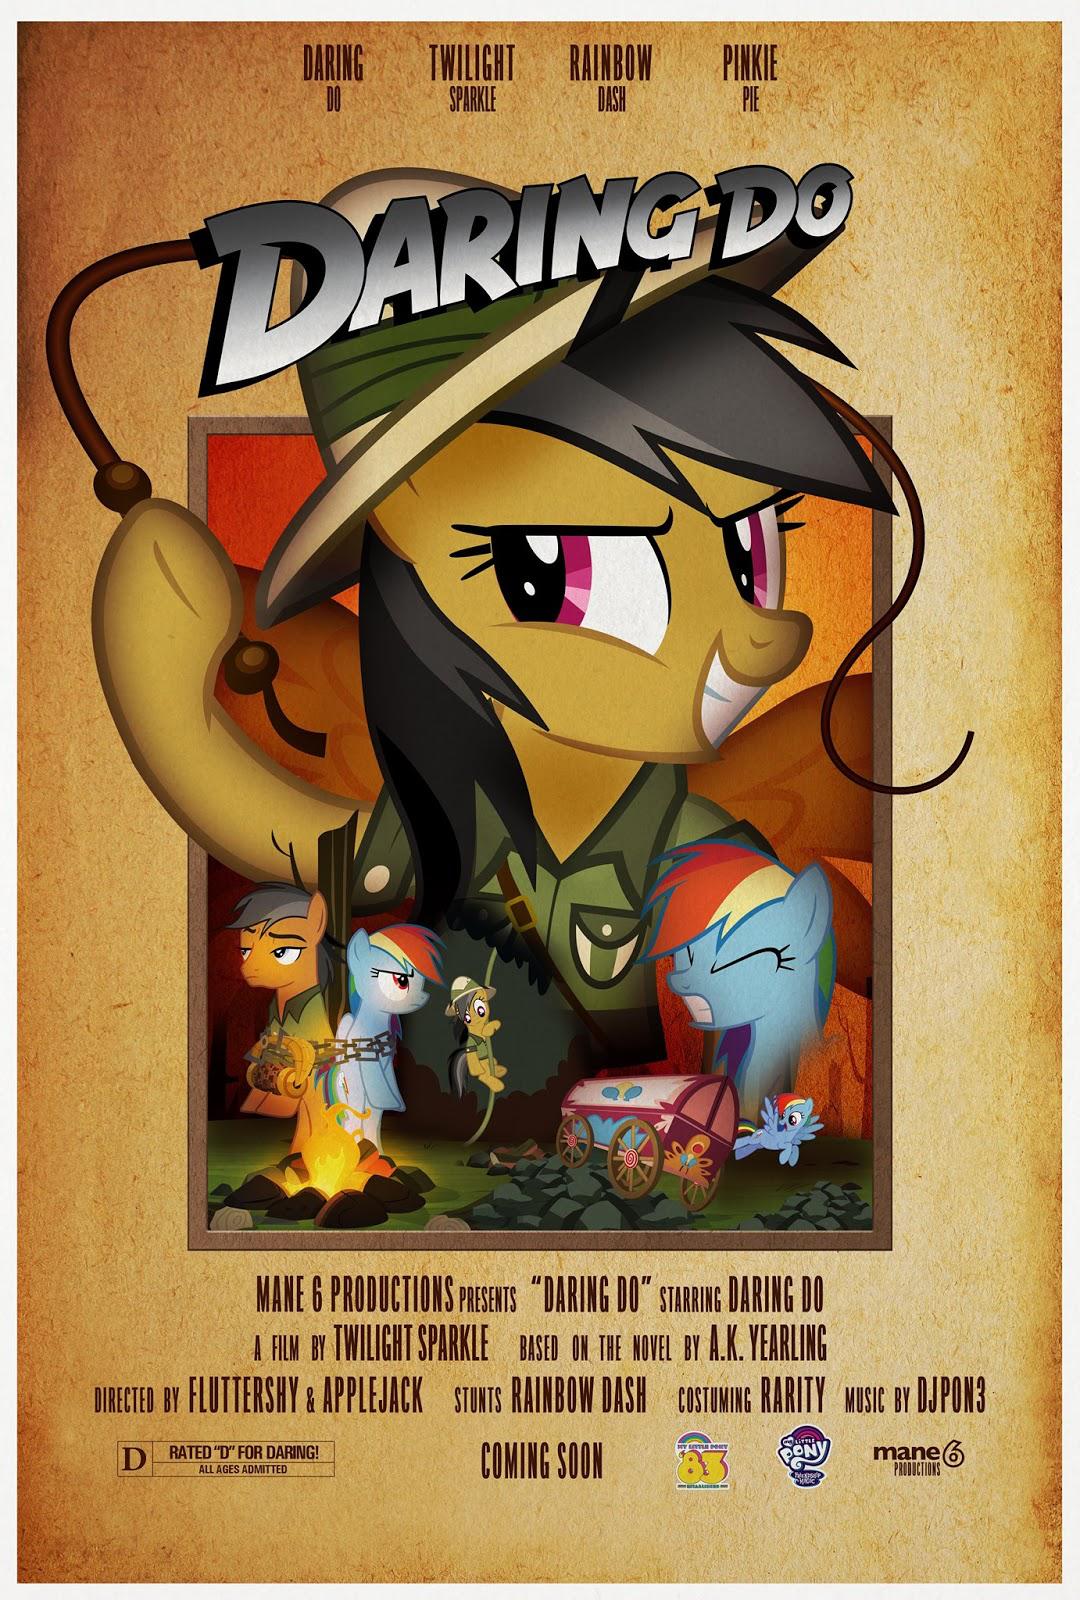 MLP Retro Week Indiana Jones parody poster.png